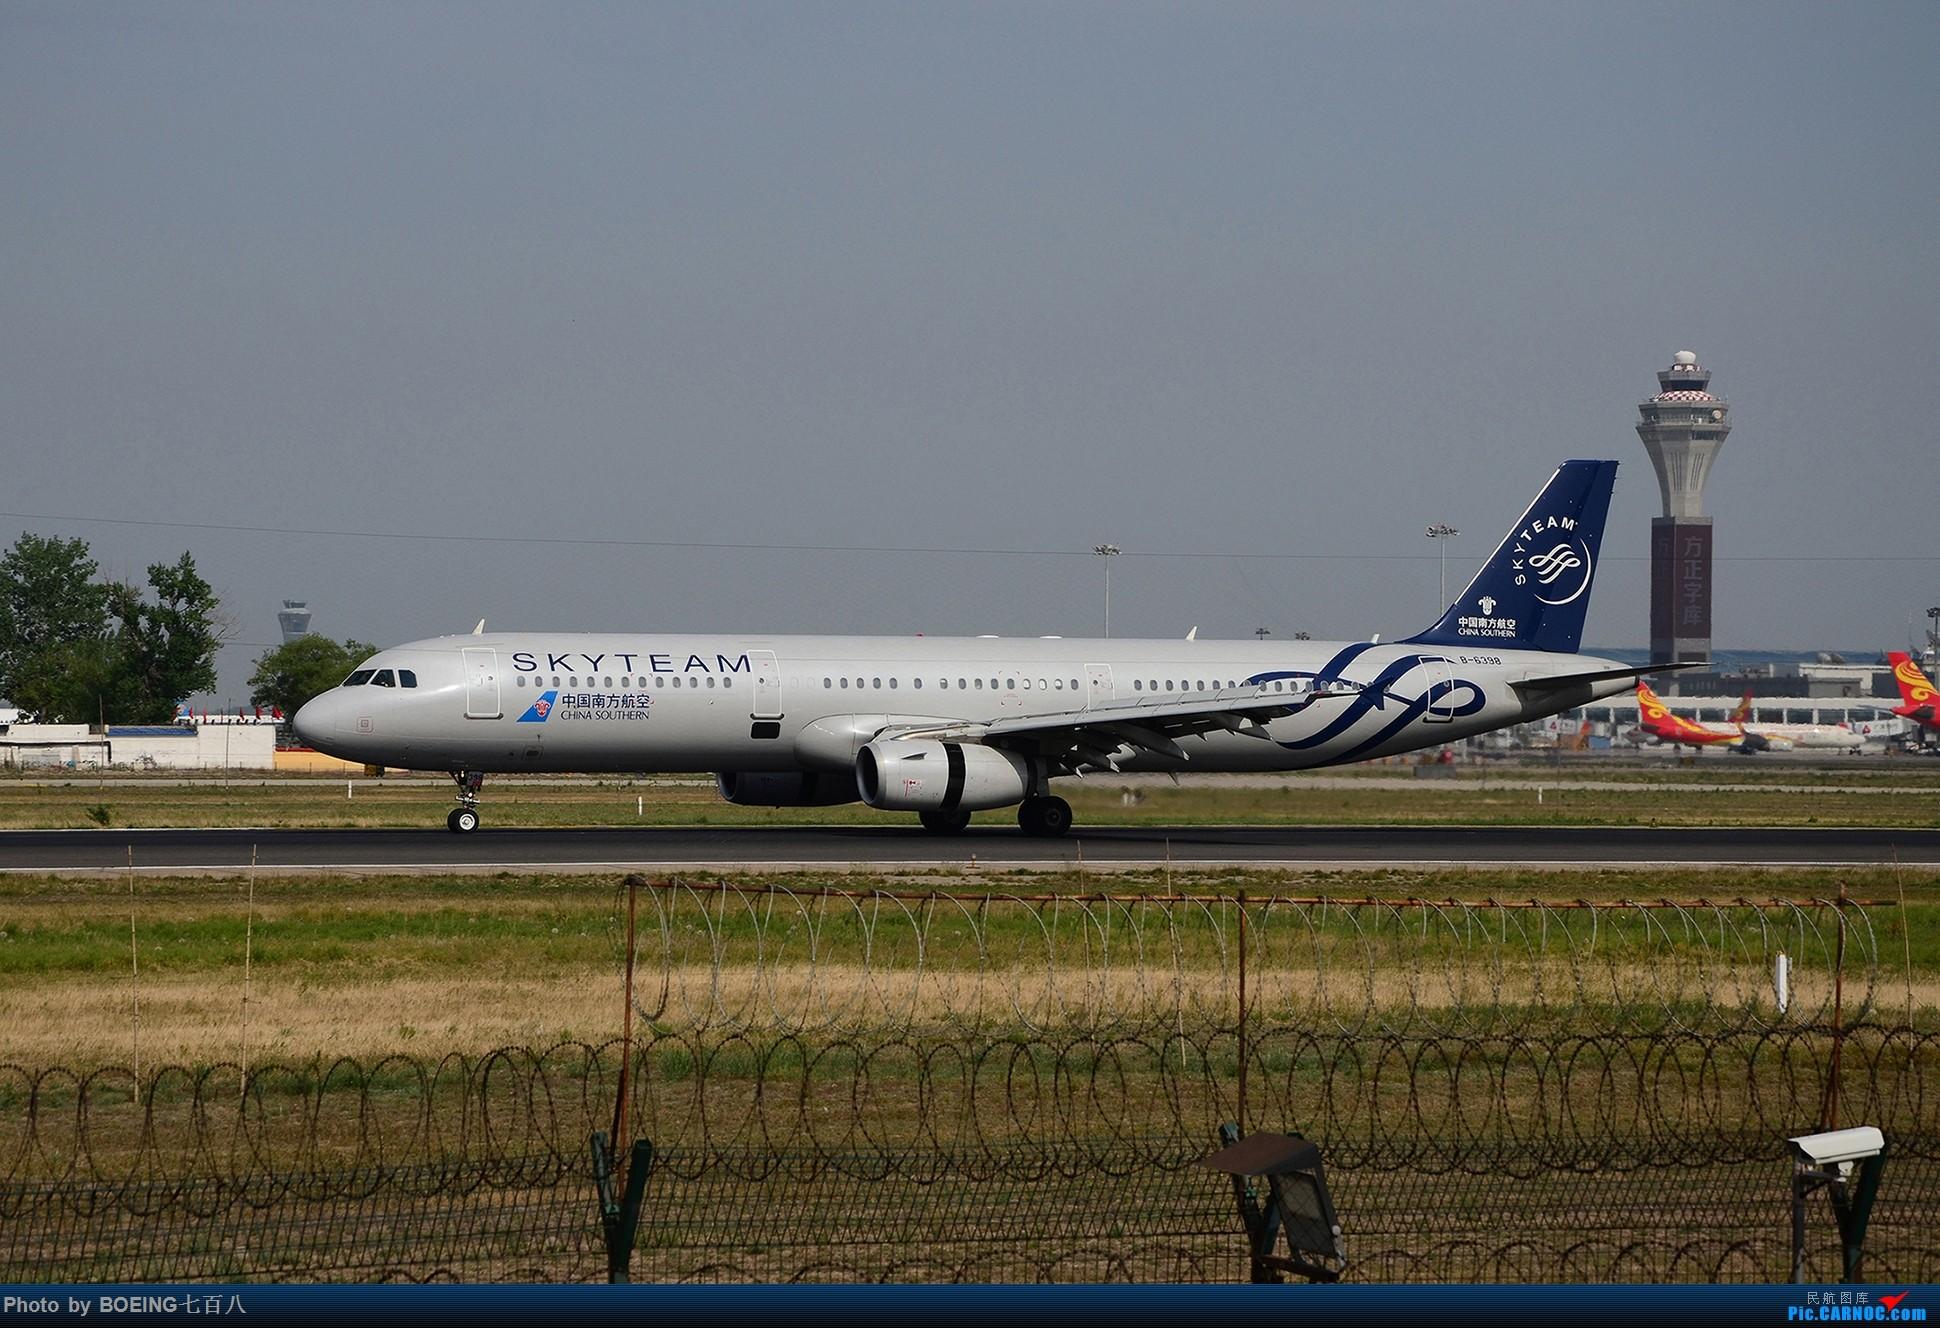 Re:[原创]海航家的黄焖熊猫和清蒸熊猫等好货 AIRBUS A321-200 B-6398 中国北京首都国际机场